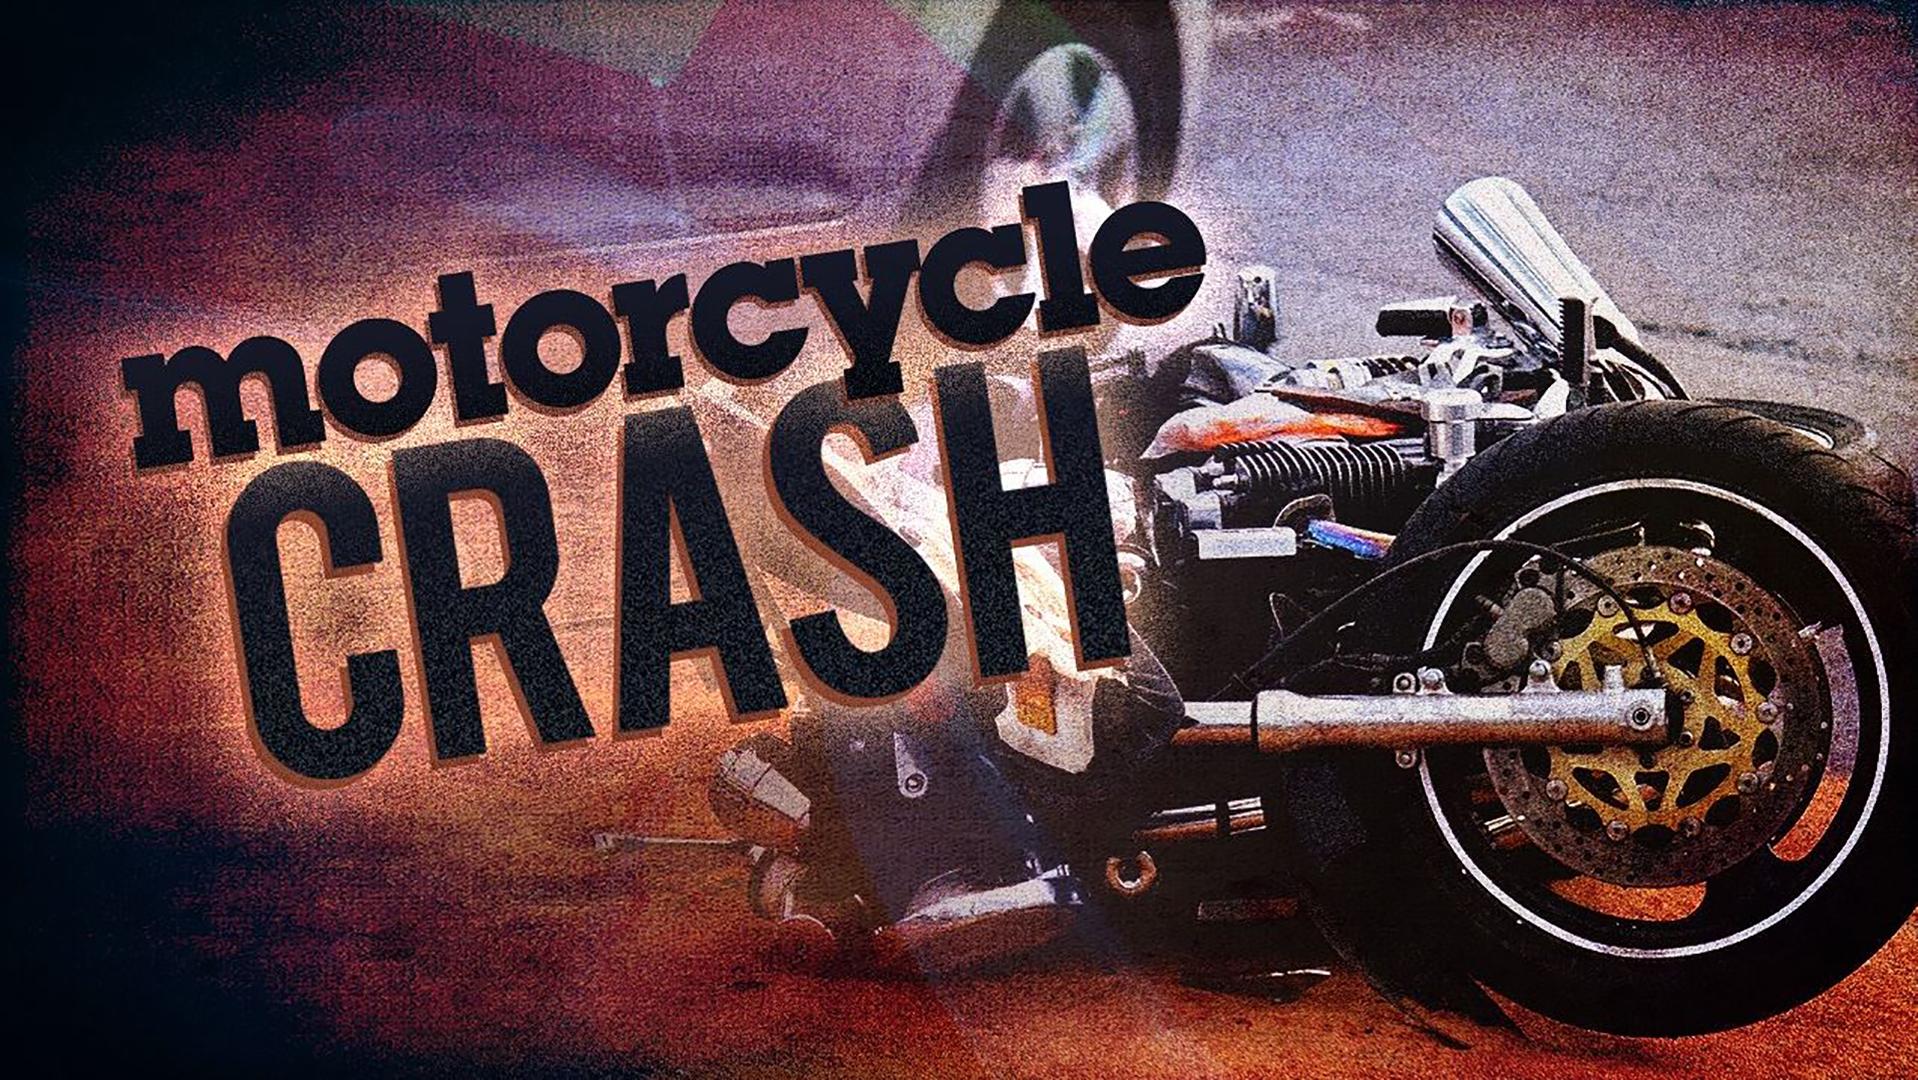 1 dead in crash involving motorcycle in Wayne Co